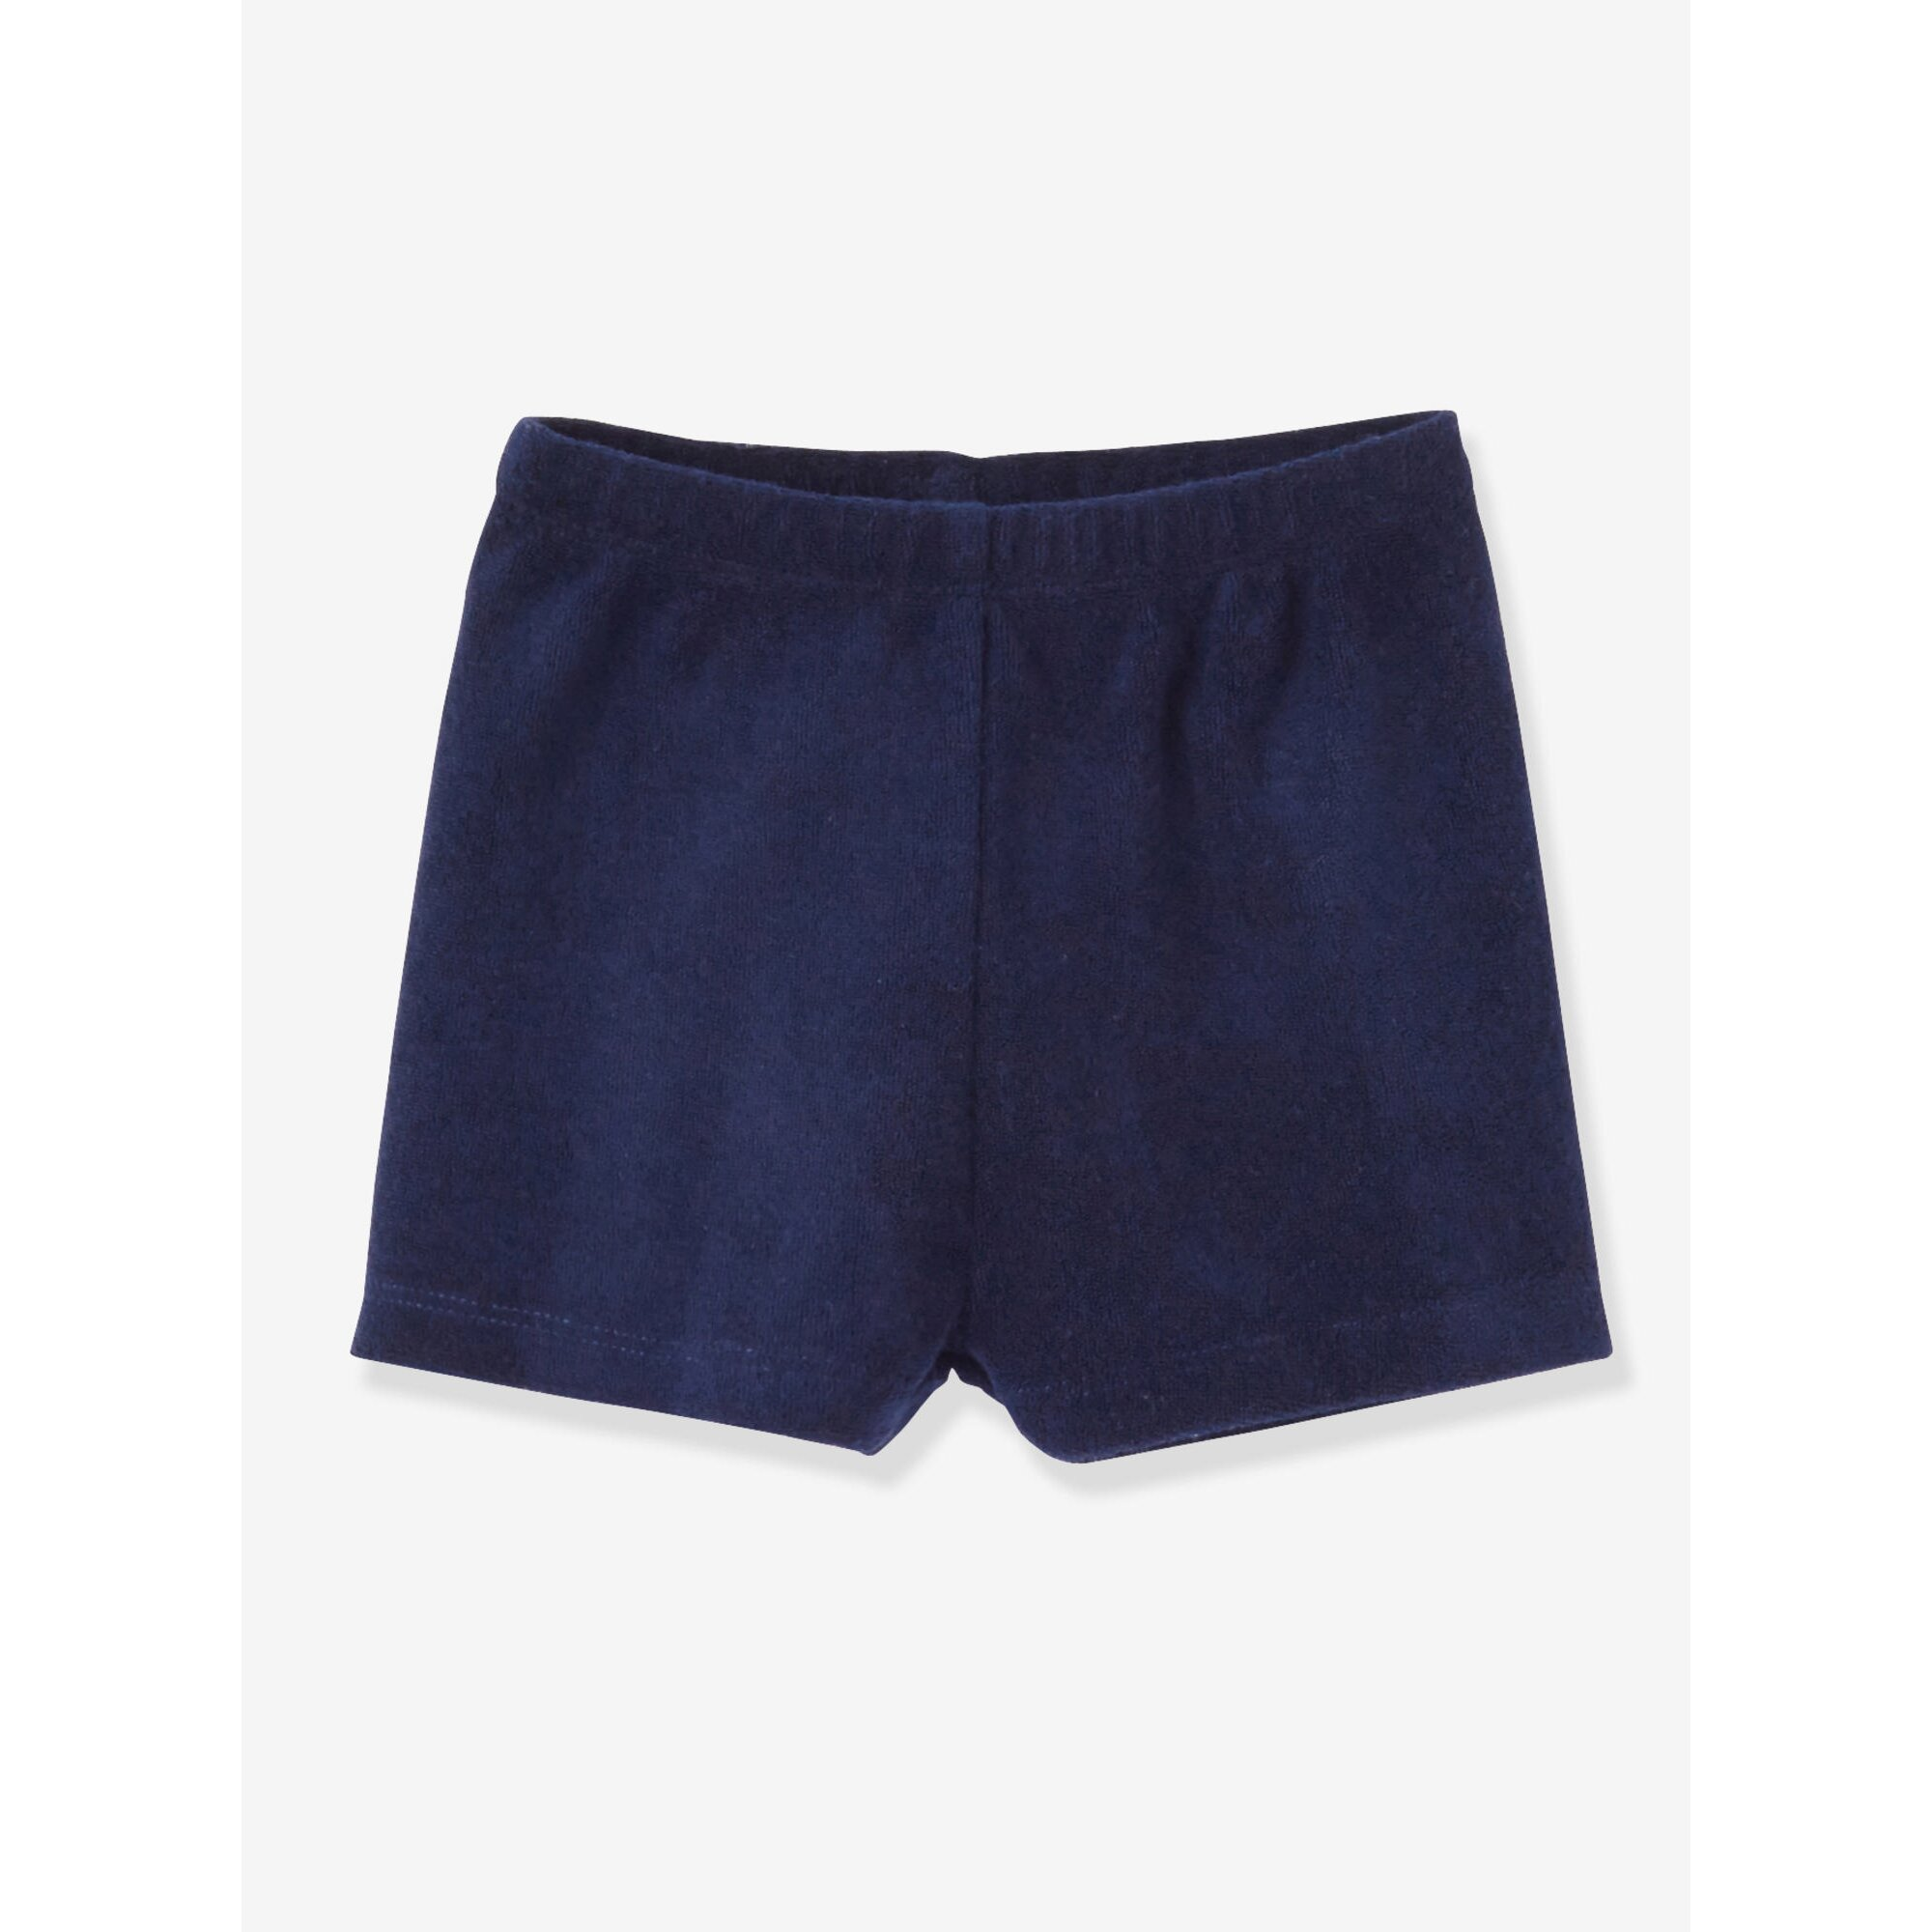 vertbaudet-4er-pack-frottee-shorts-baby-jungen